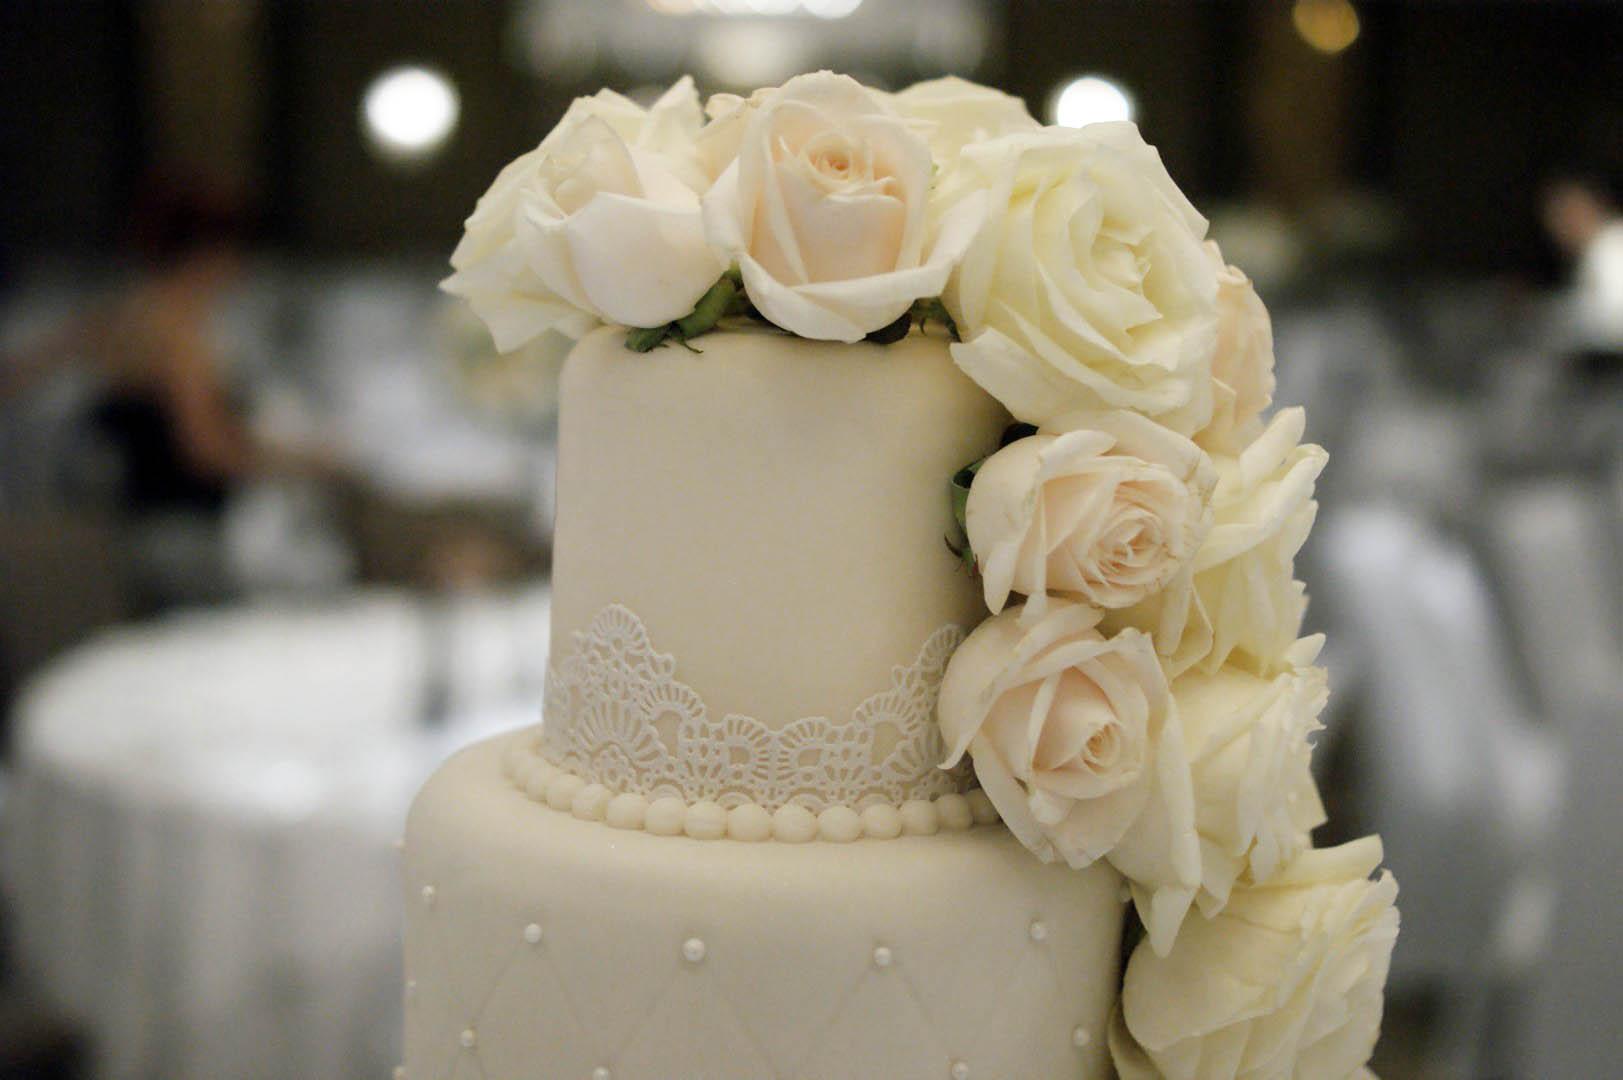 6 Tier Wedding Cake White Iced Fresh